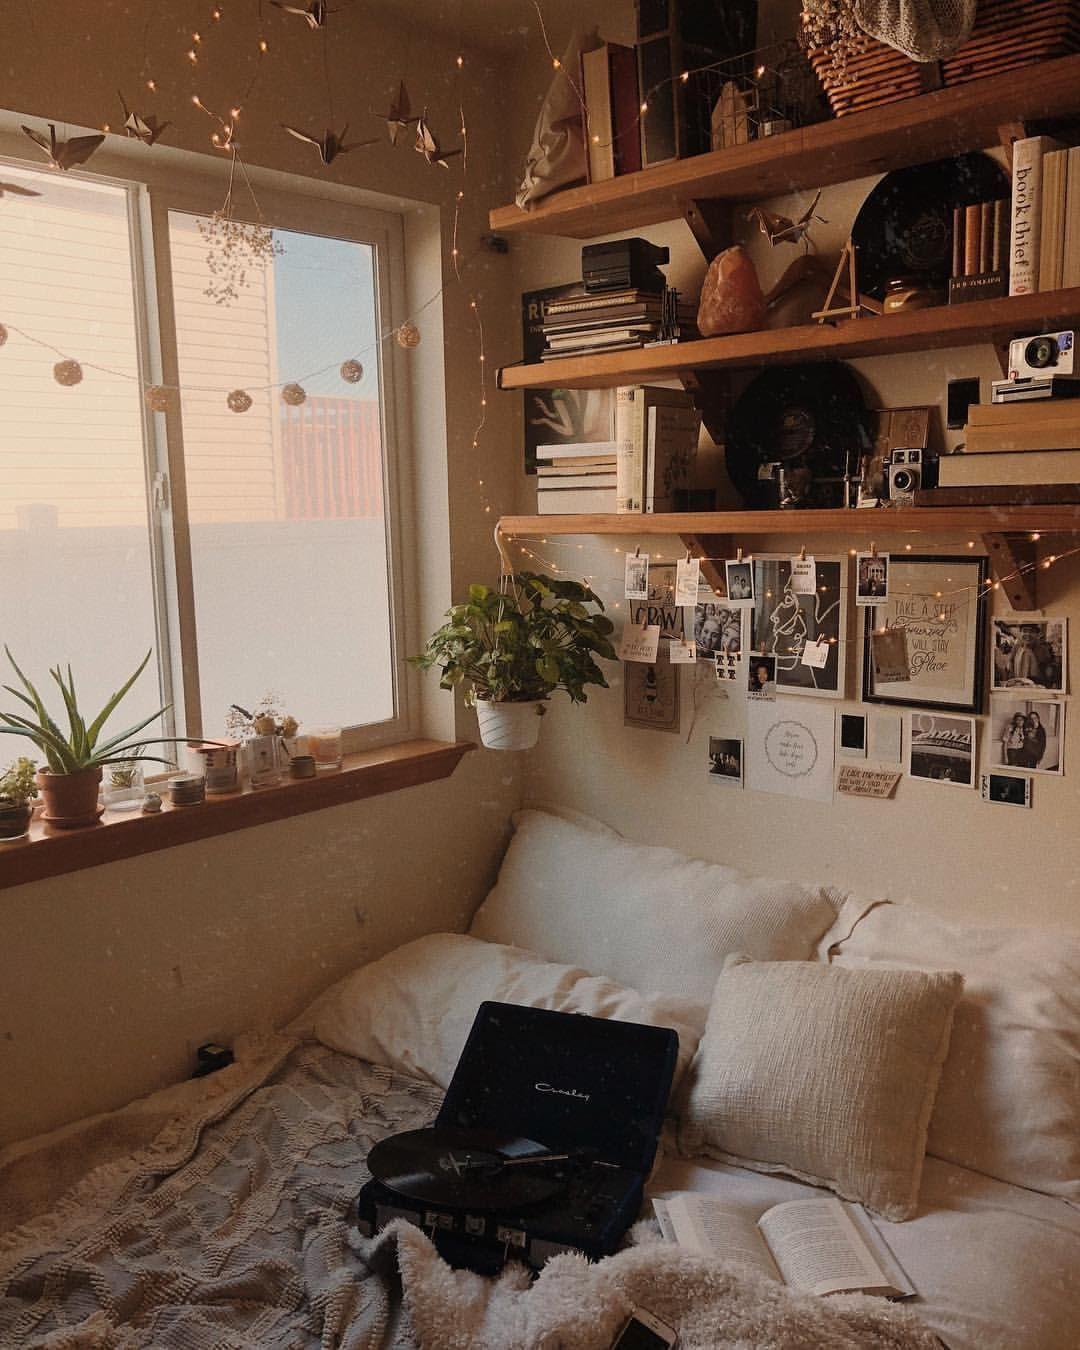 57 Cozy Diy Apartment Decor Ideas - DECOONA   House rooms ...